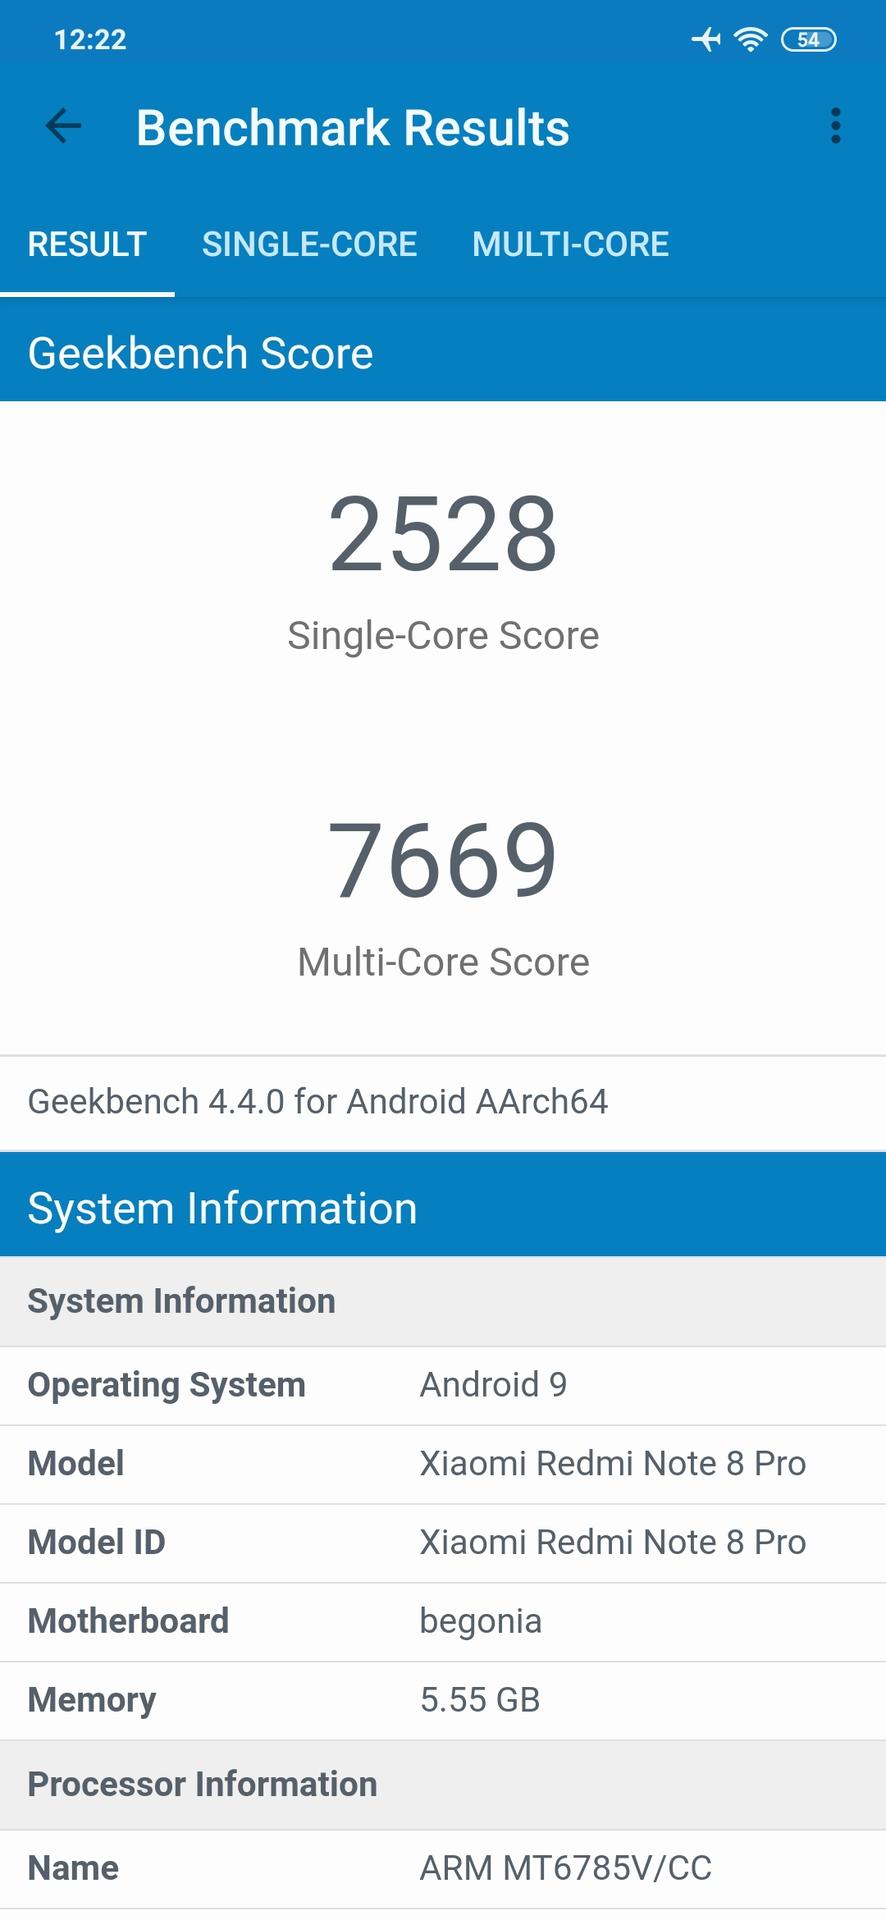 Redmi Note 8 Pro Geekbench 4 results